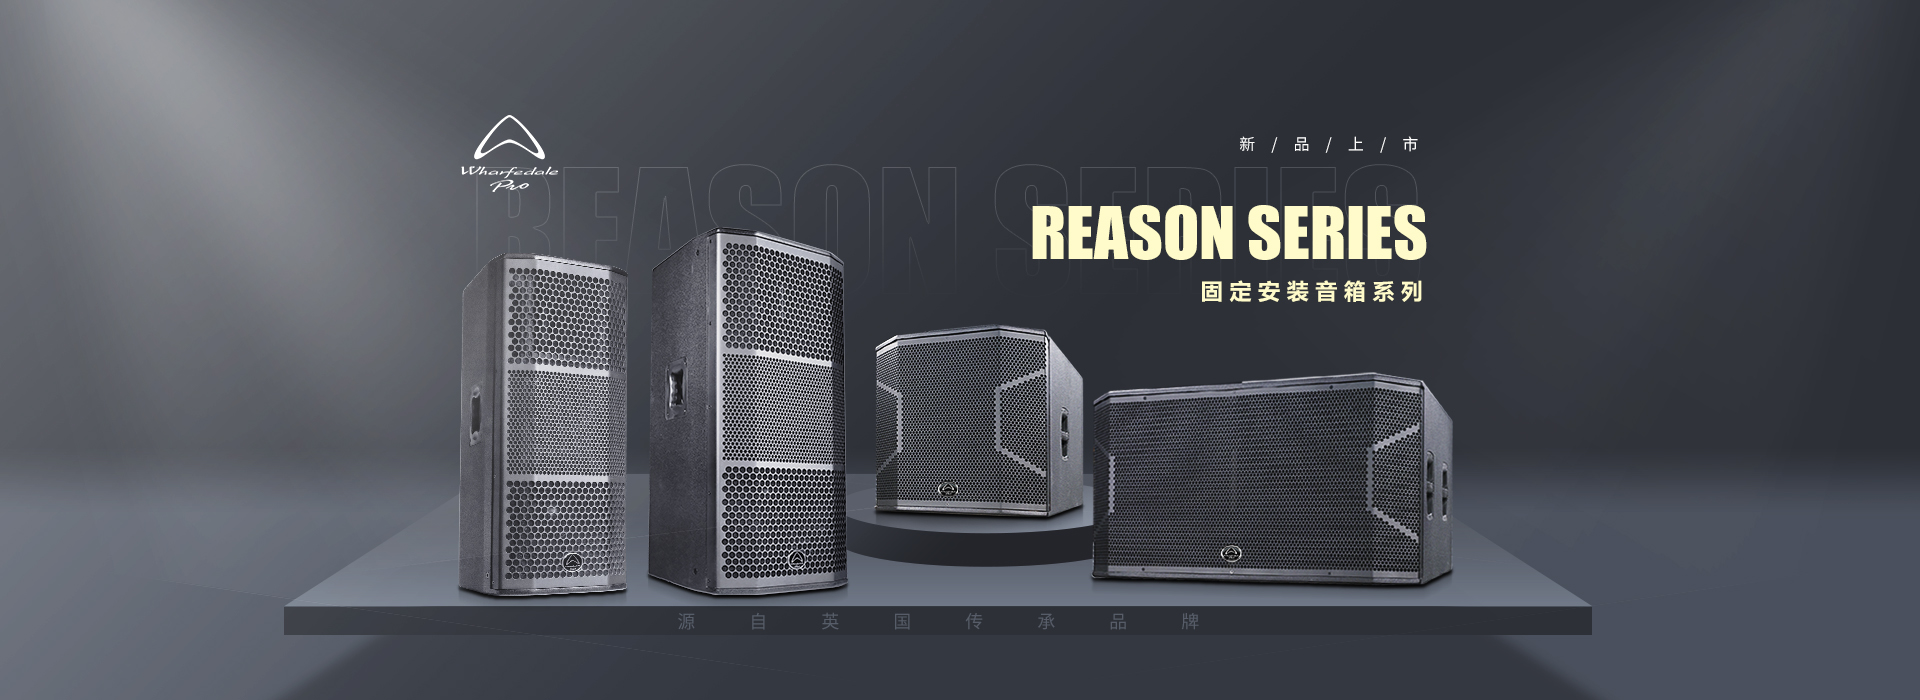 REASON SERIES